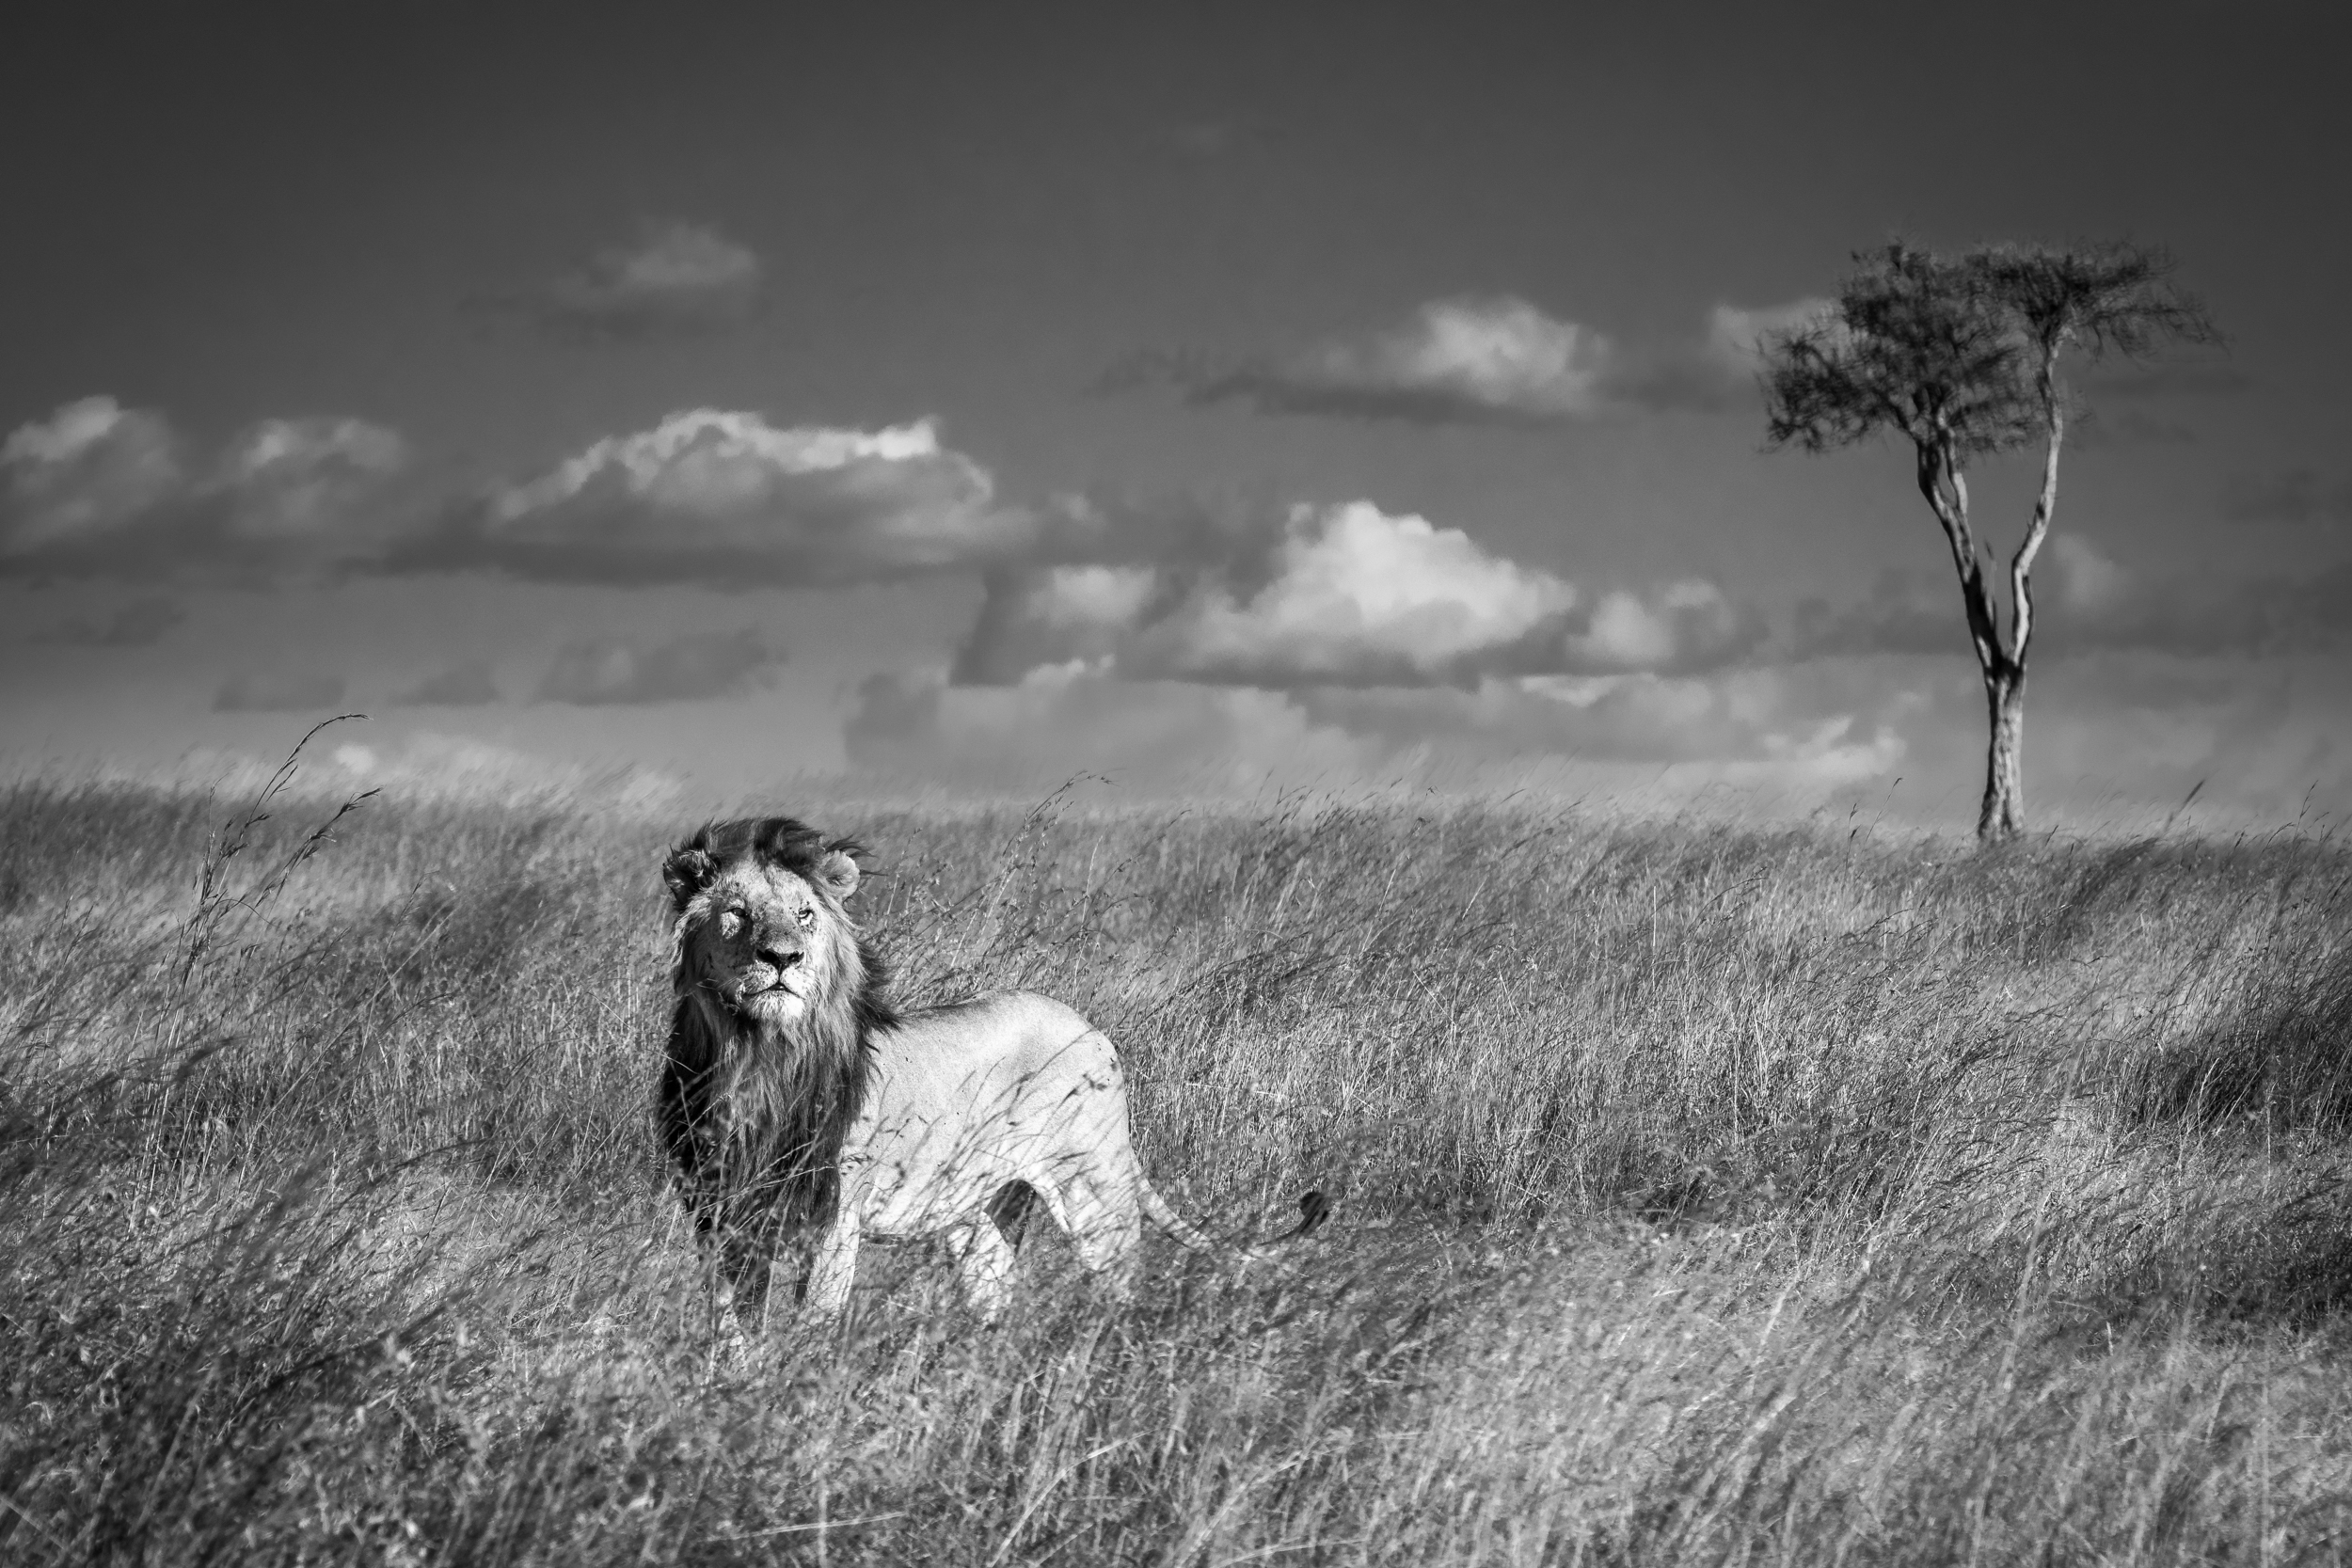 A male lion surveys the land in the Maasai Mara, Kenya